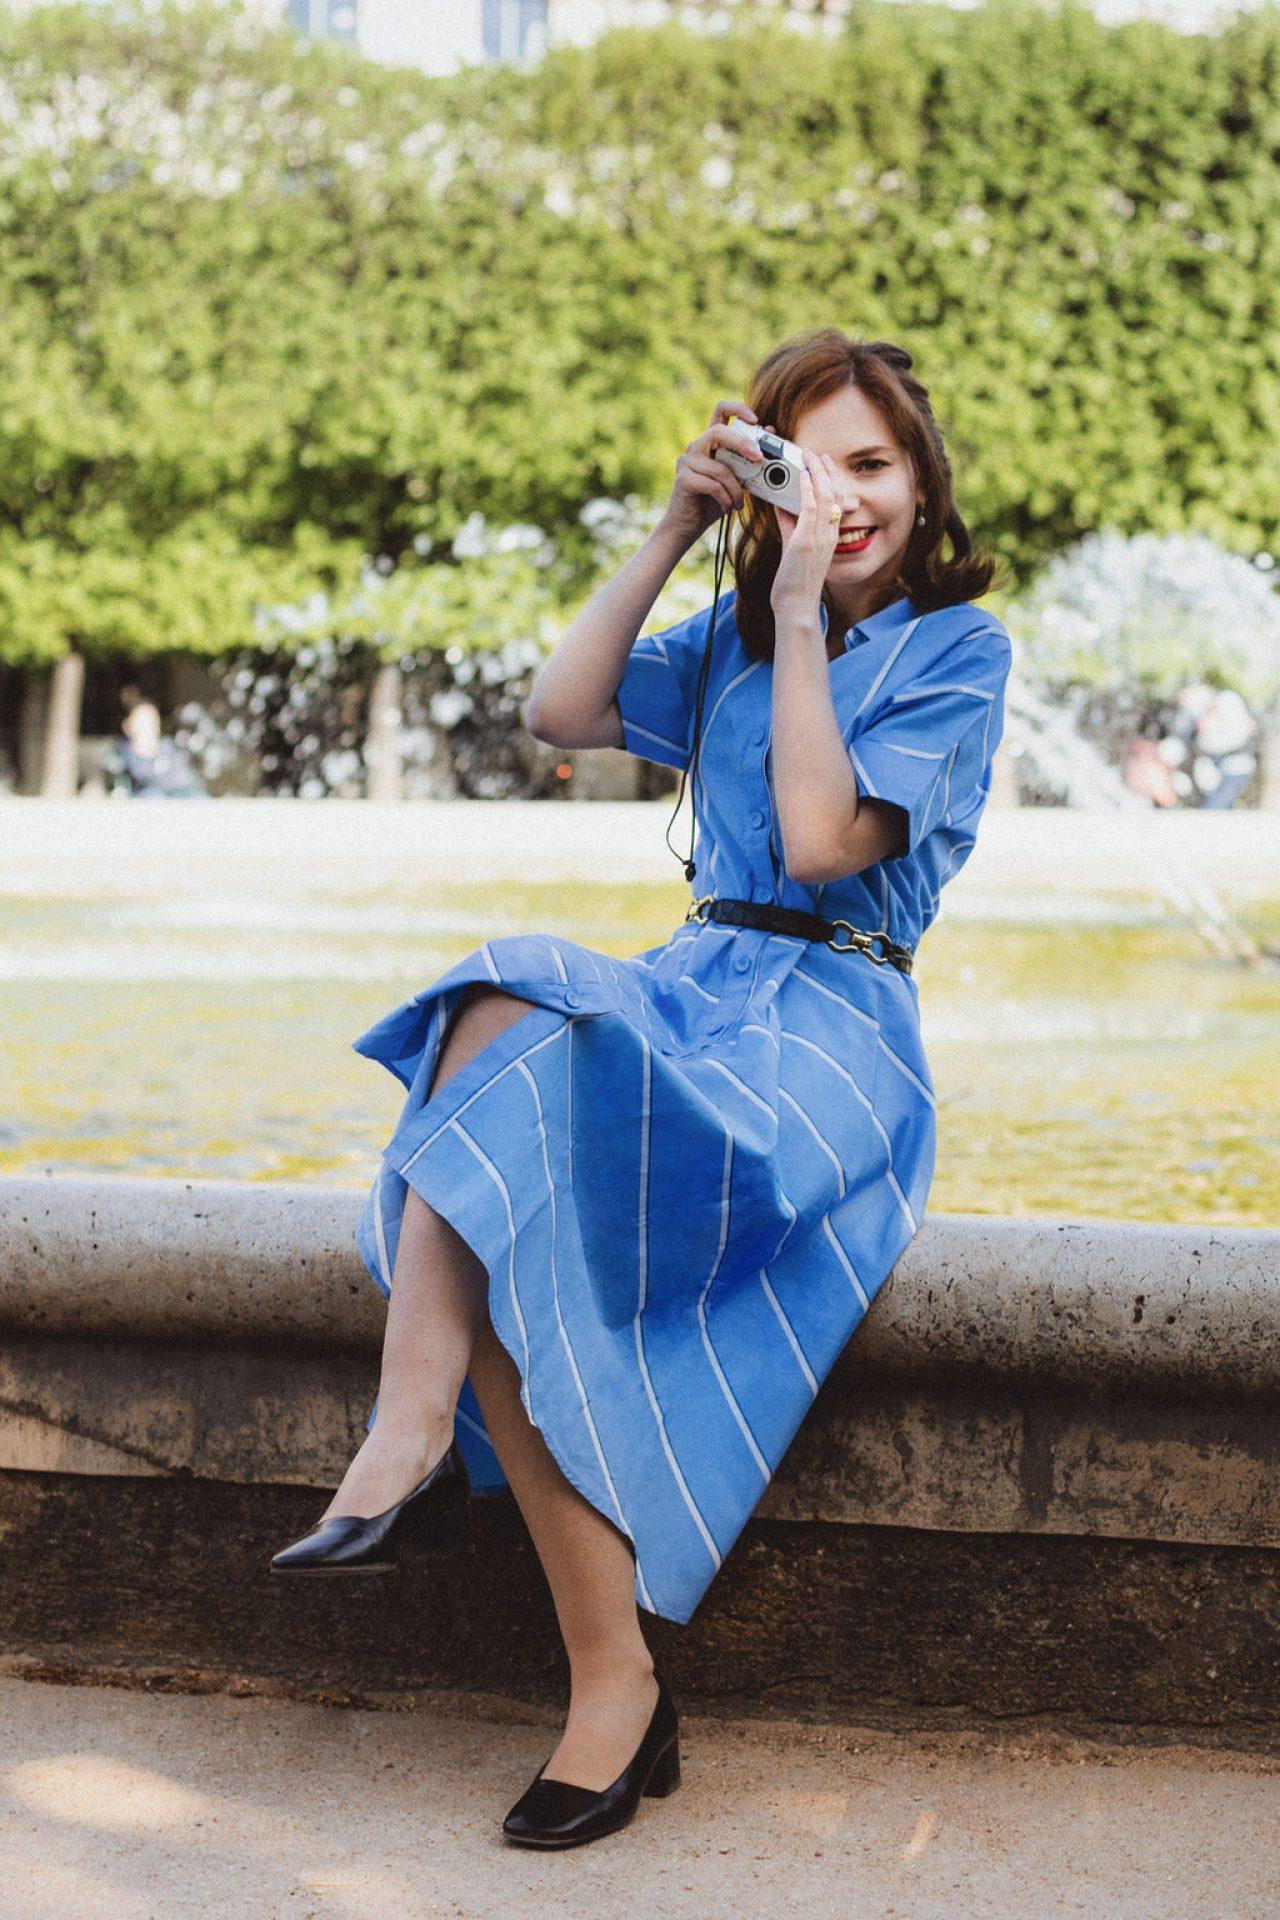 lifestyle fashion photoshoot for Sussan Shokranian